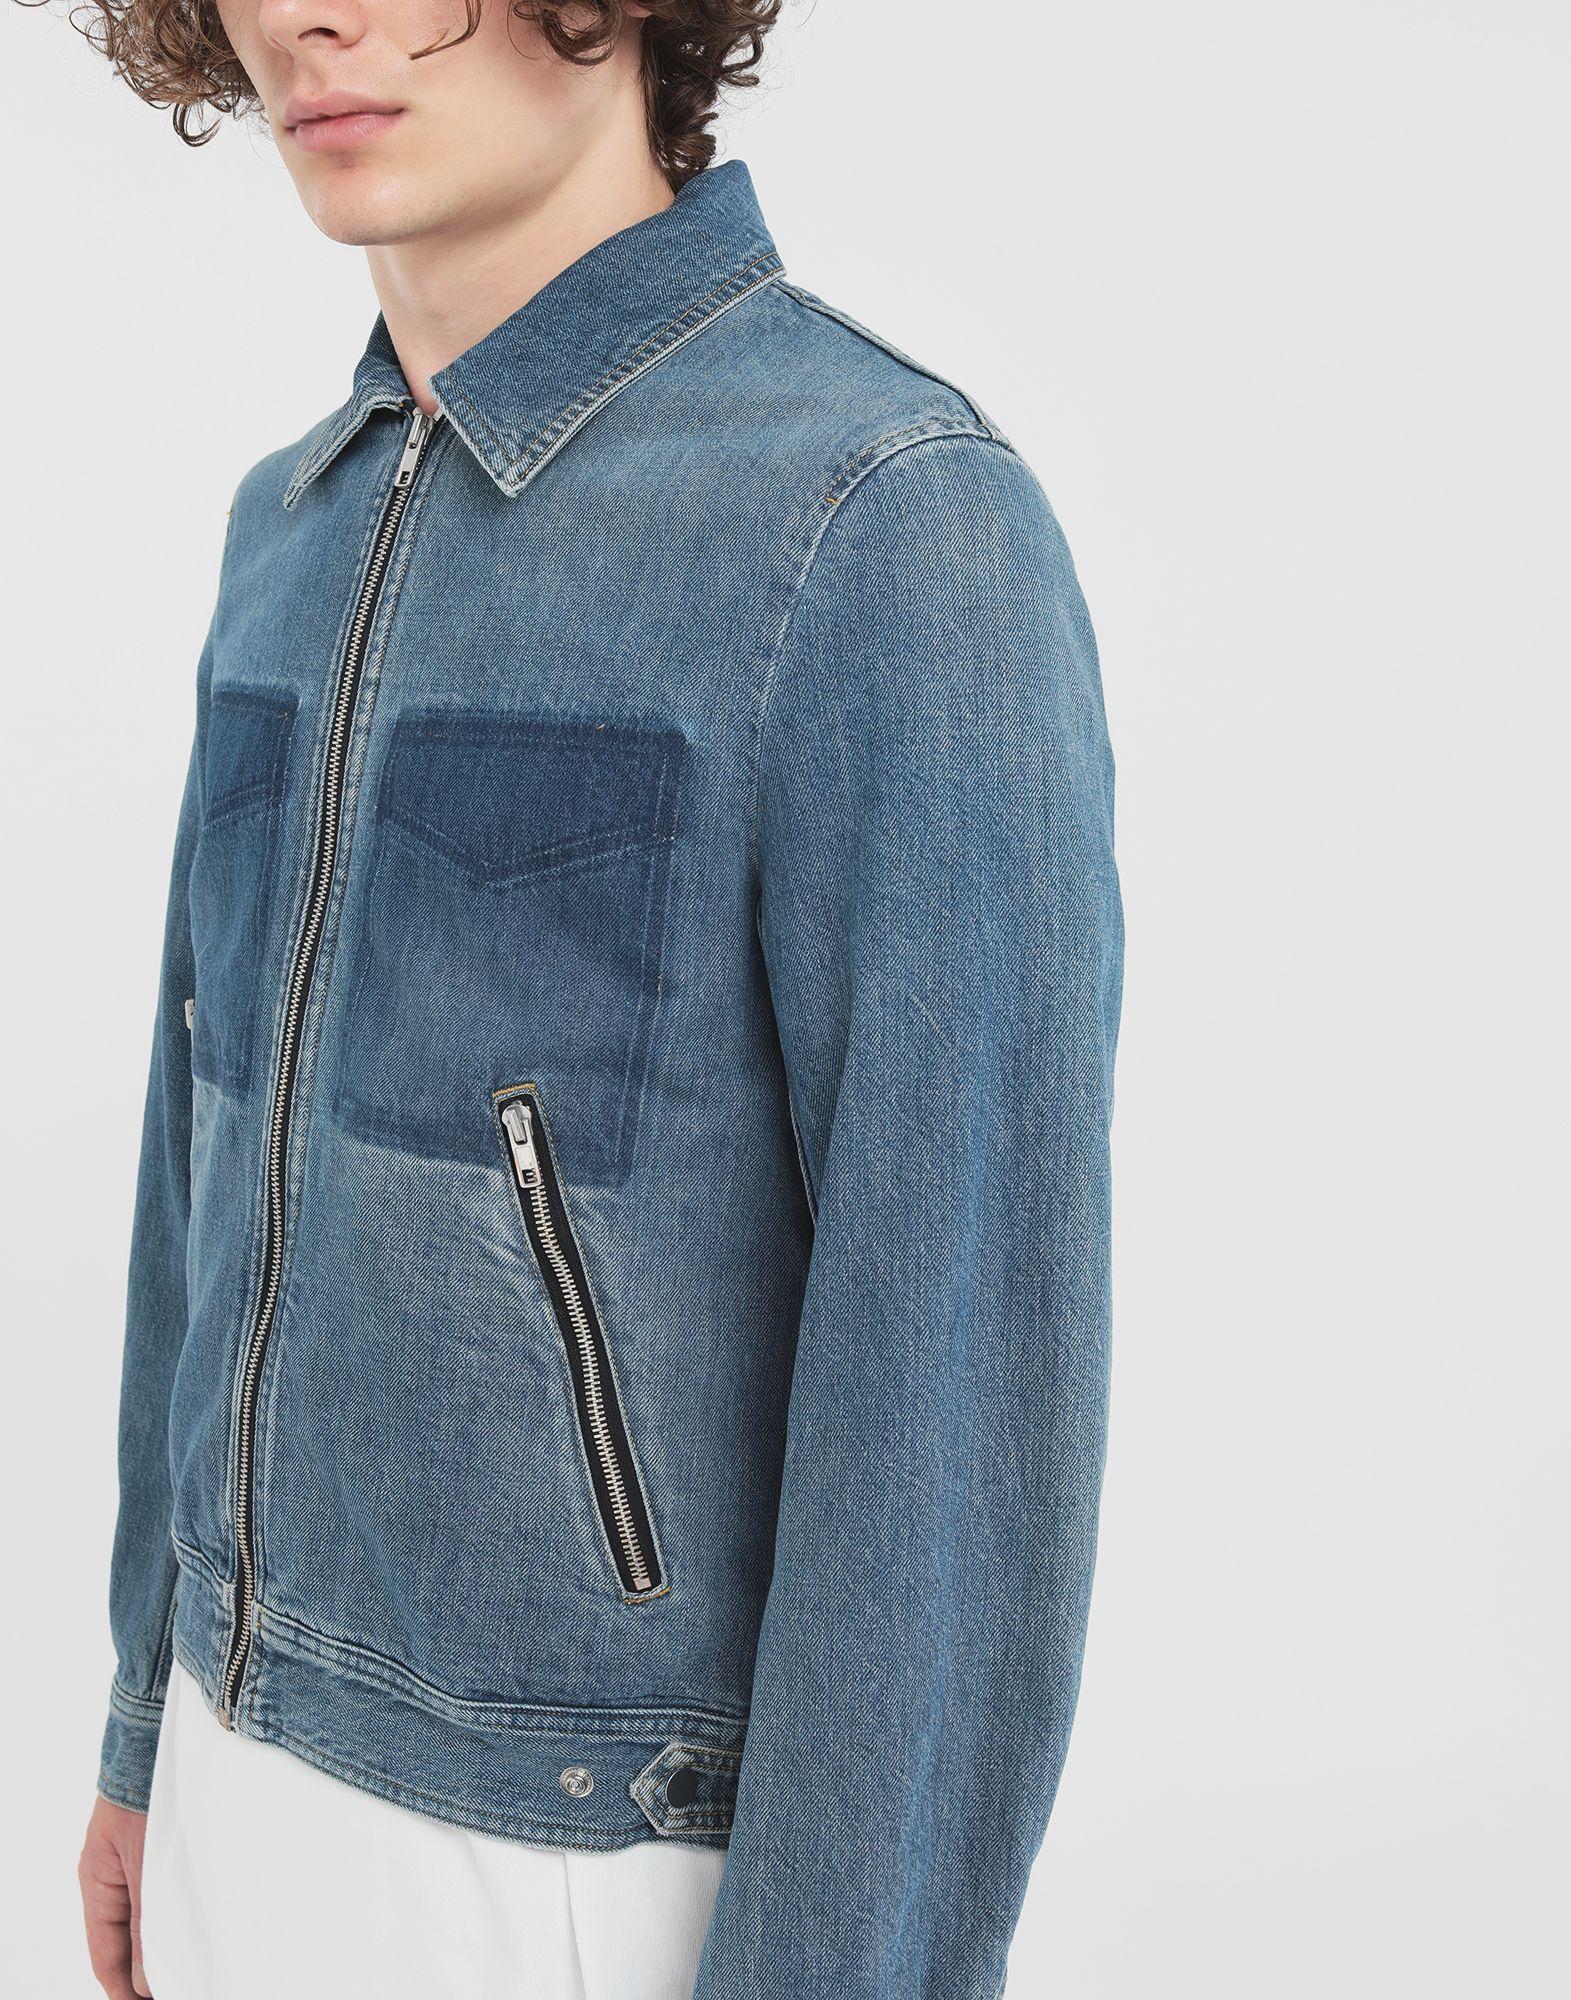 MAISON MARGIELA Zip denim jacket Blazer Man a